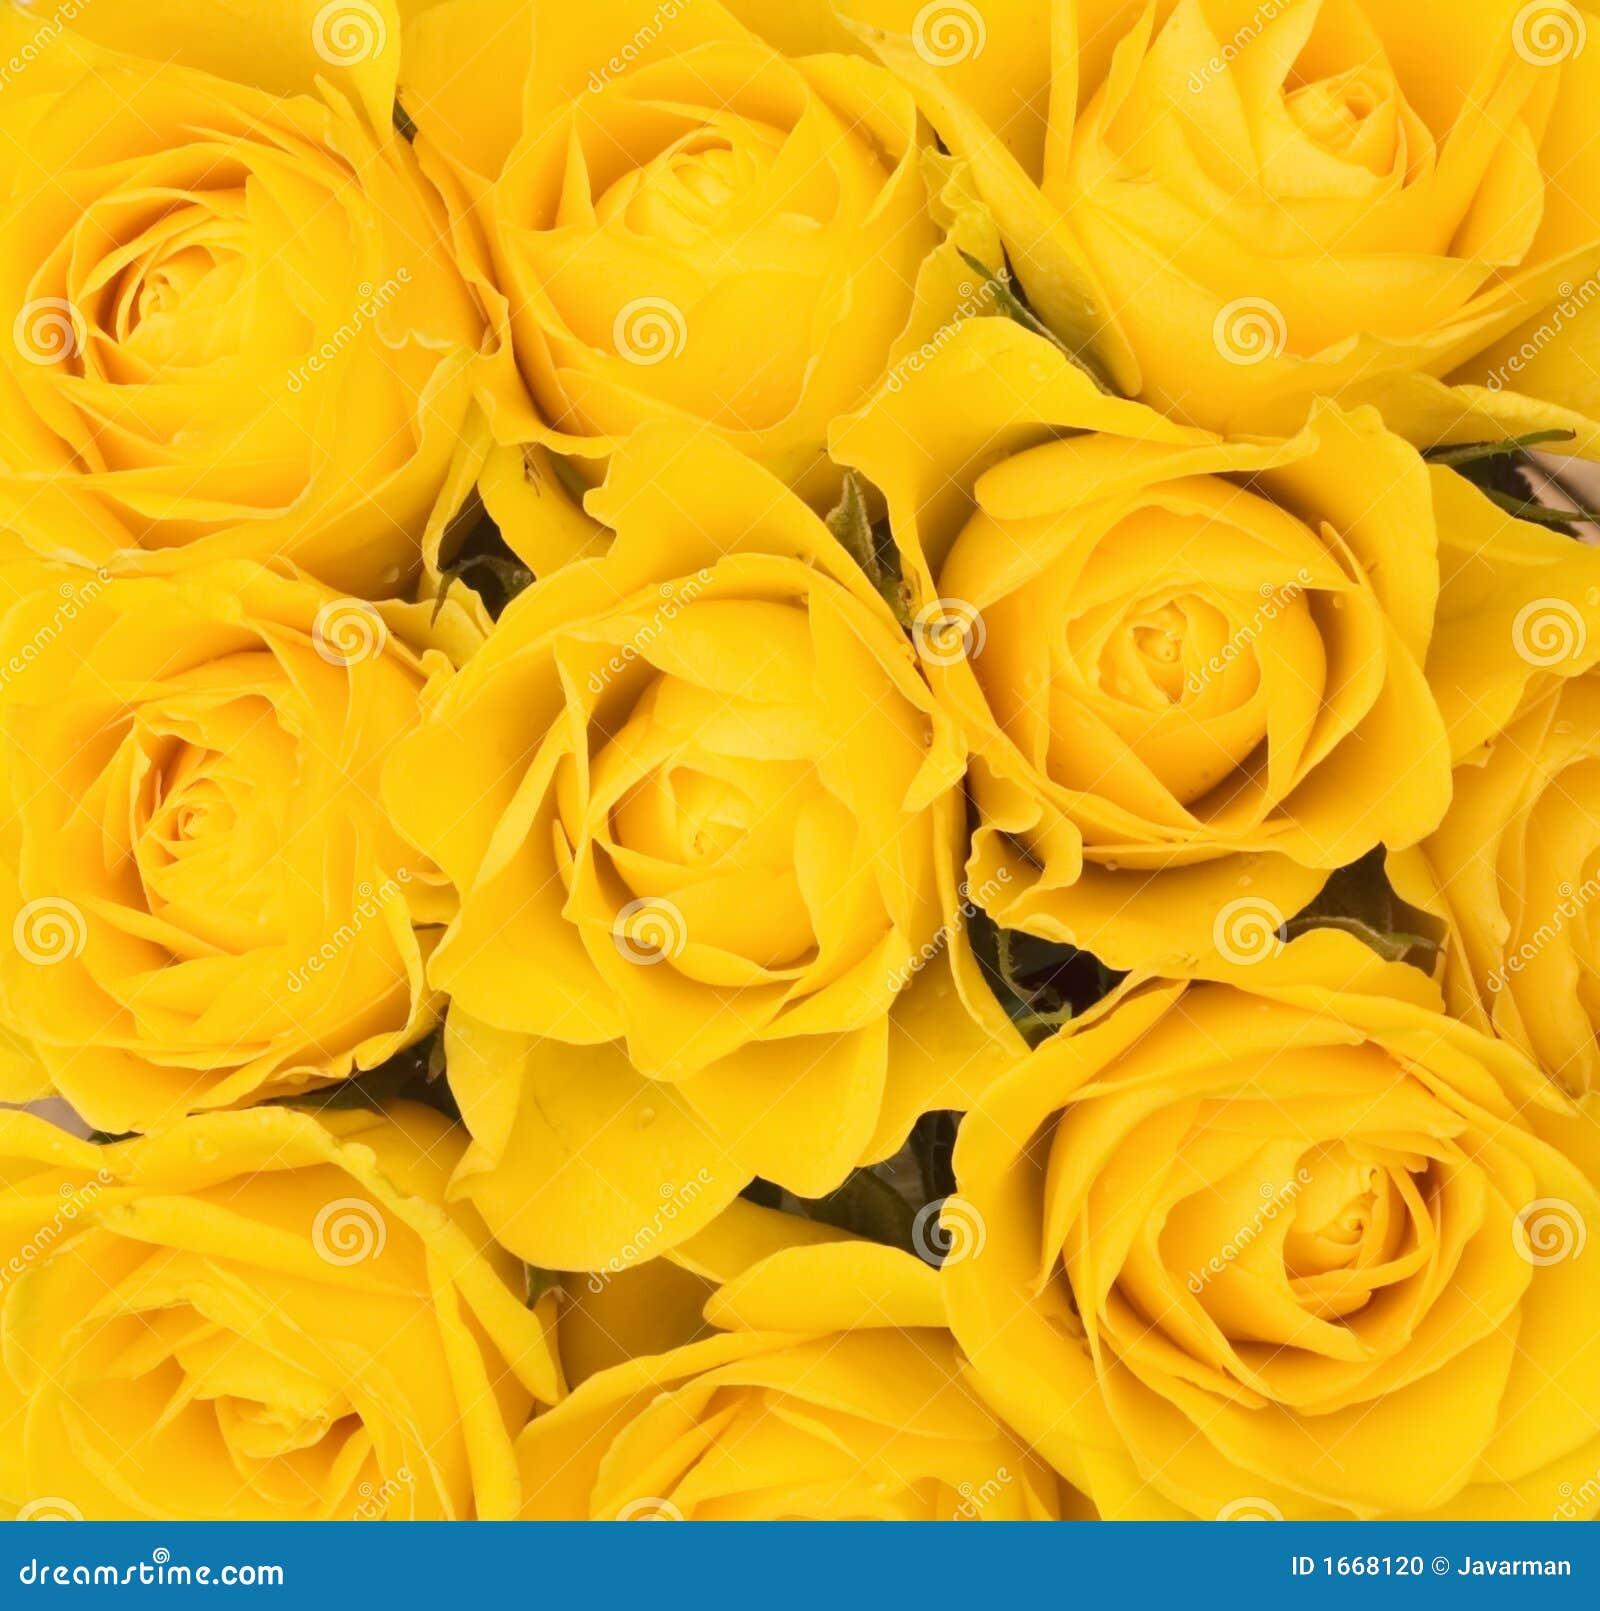 c7892889b Fundo de rosas amarelas foto de stock. Imagem de macro - 1668120